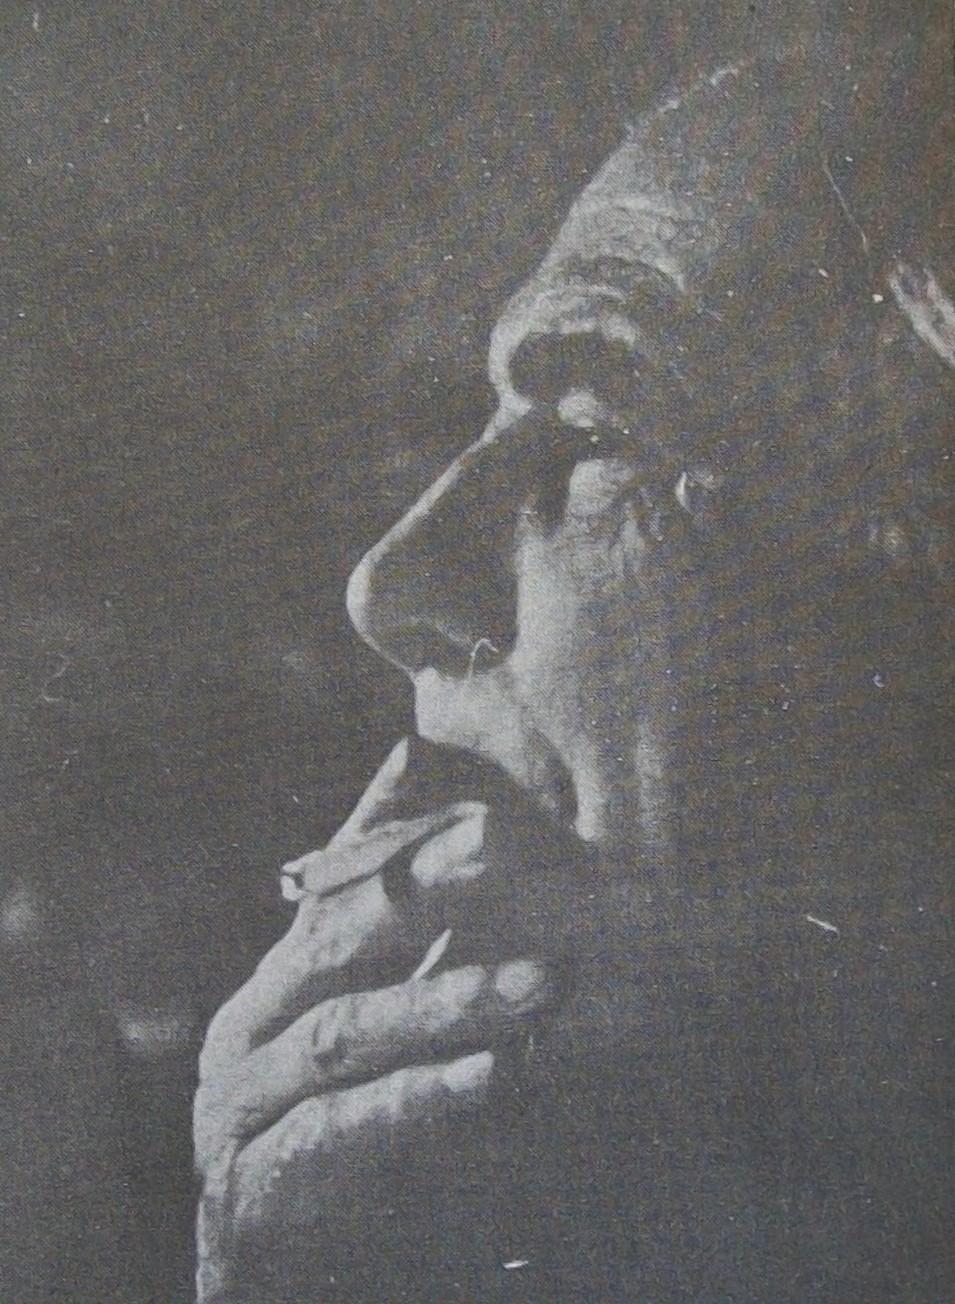 http://upload.wikimedia.org/wikipedia/commons/f/fc/Aldo_Pellegrini.JPG